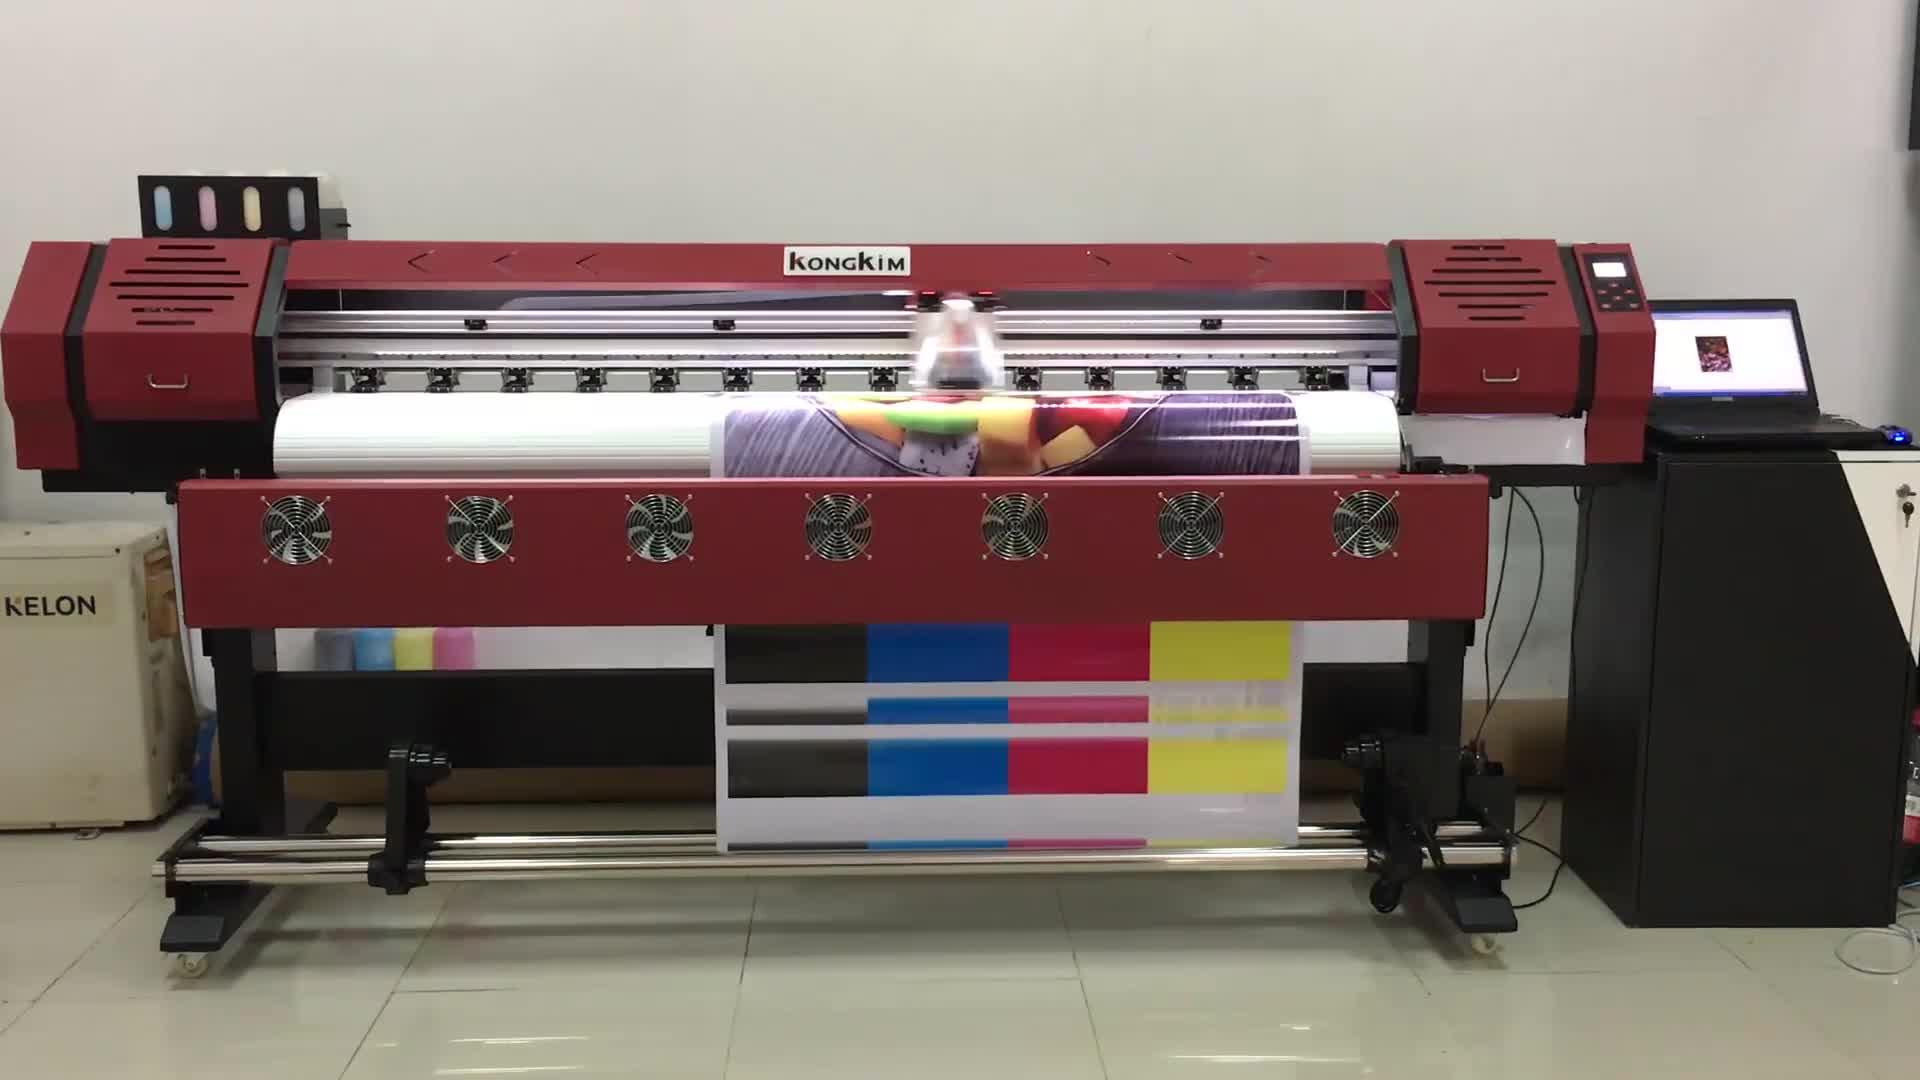 KK-1600 1.8m / 3.2m eco-solvent printer available for outdoor tarpaulin car sticker flex banner